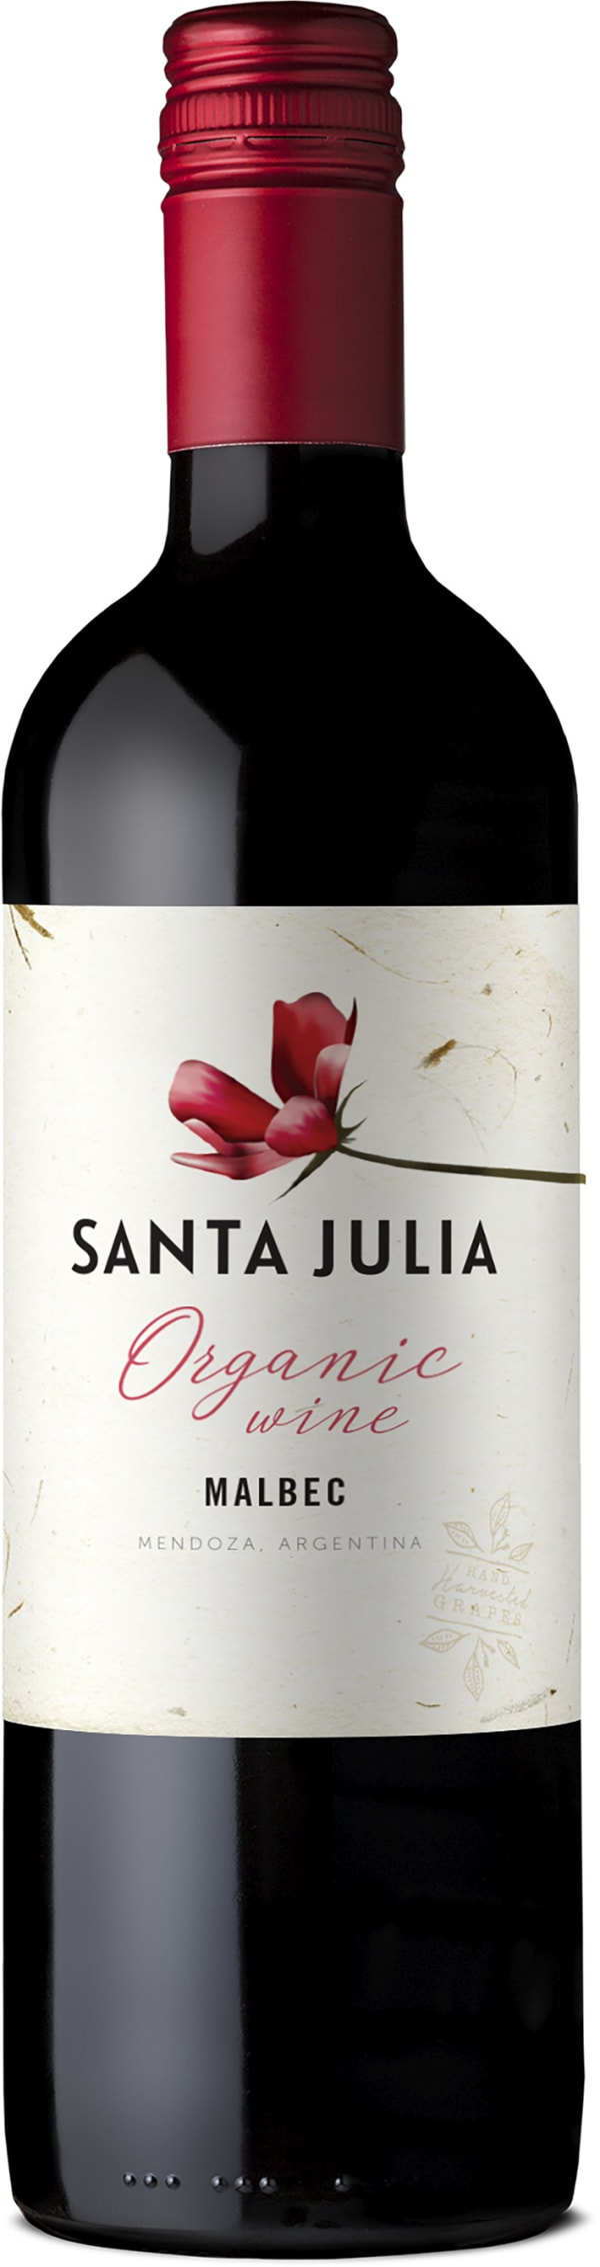 Santa Julia Organic Malbec